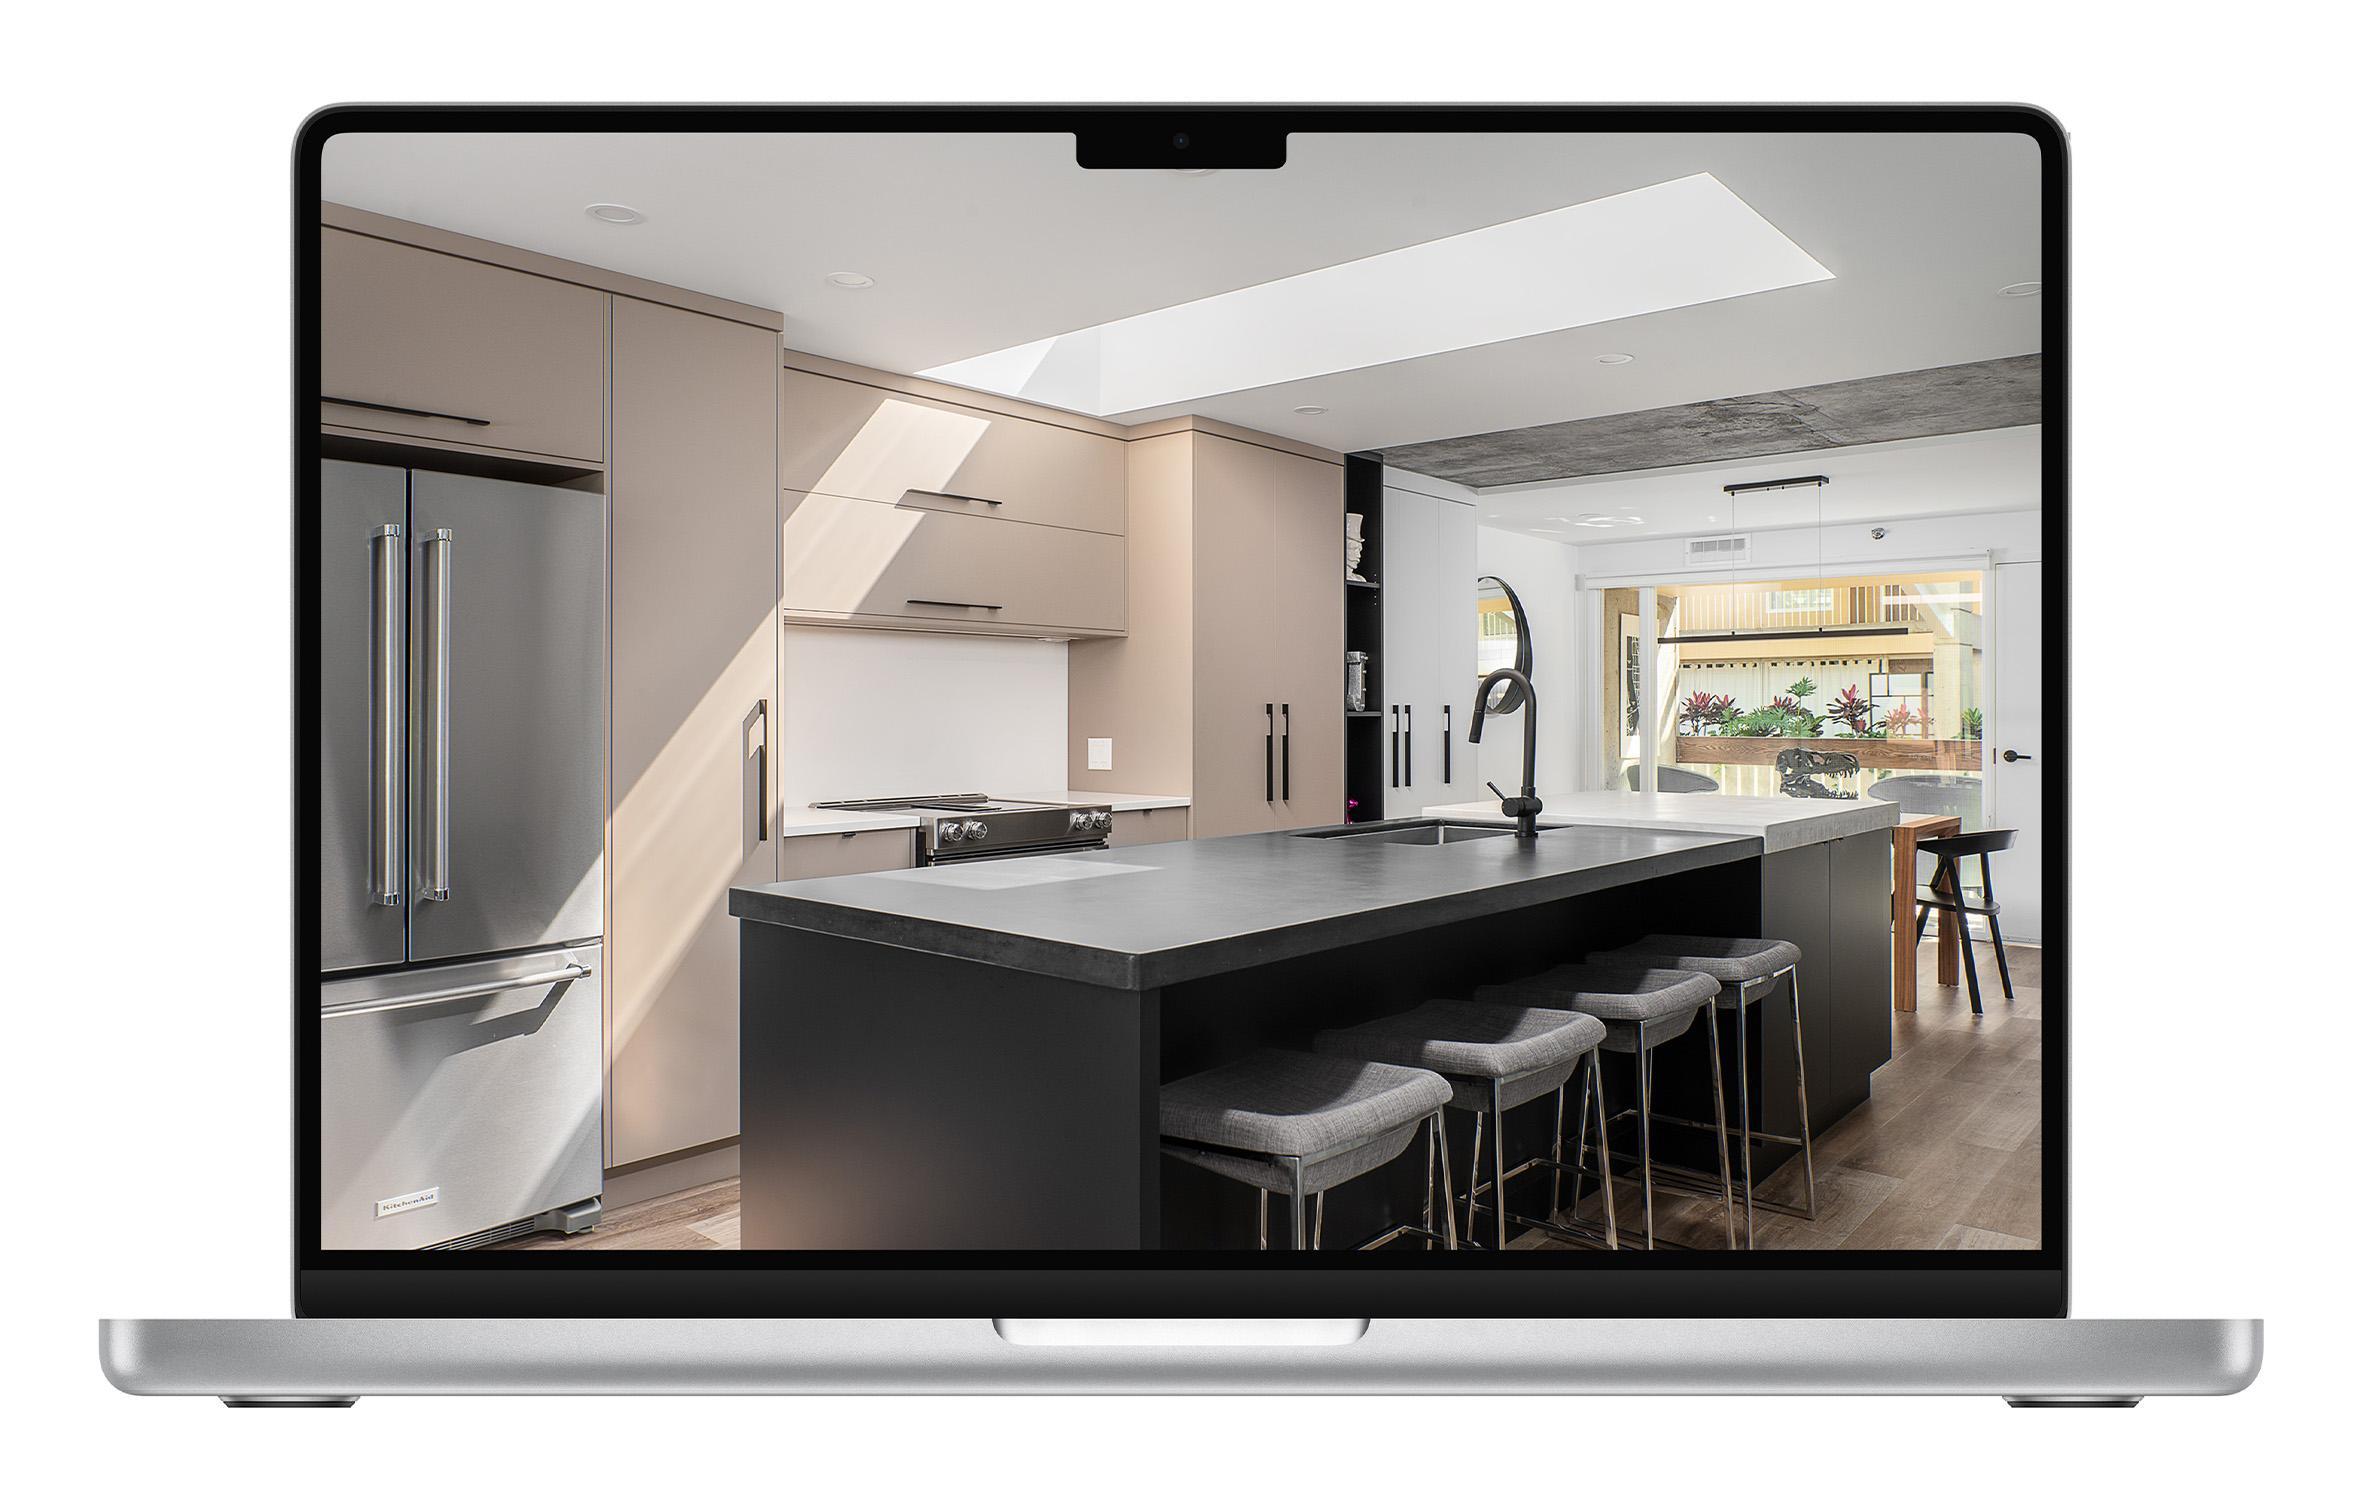 Three photos of home interior